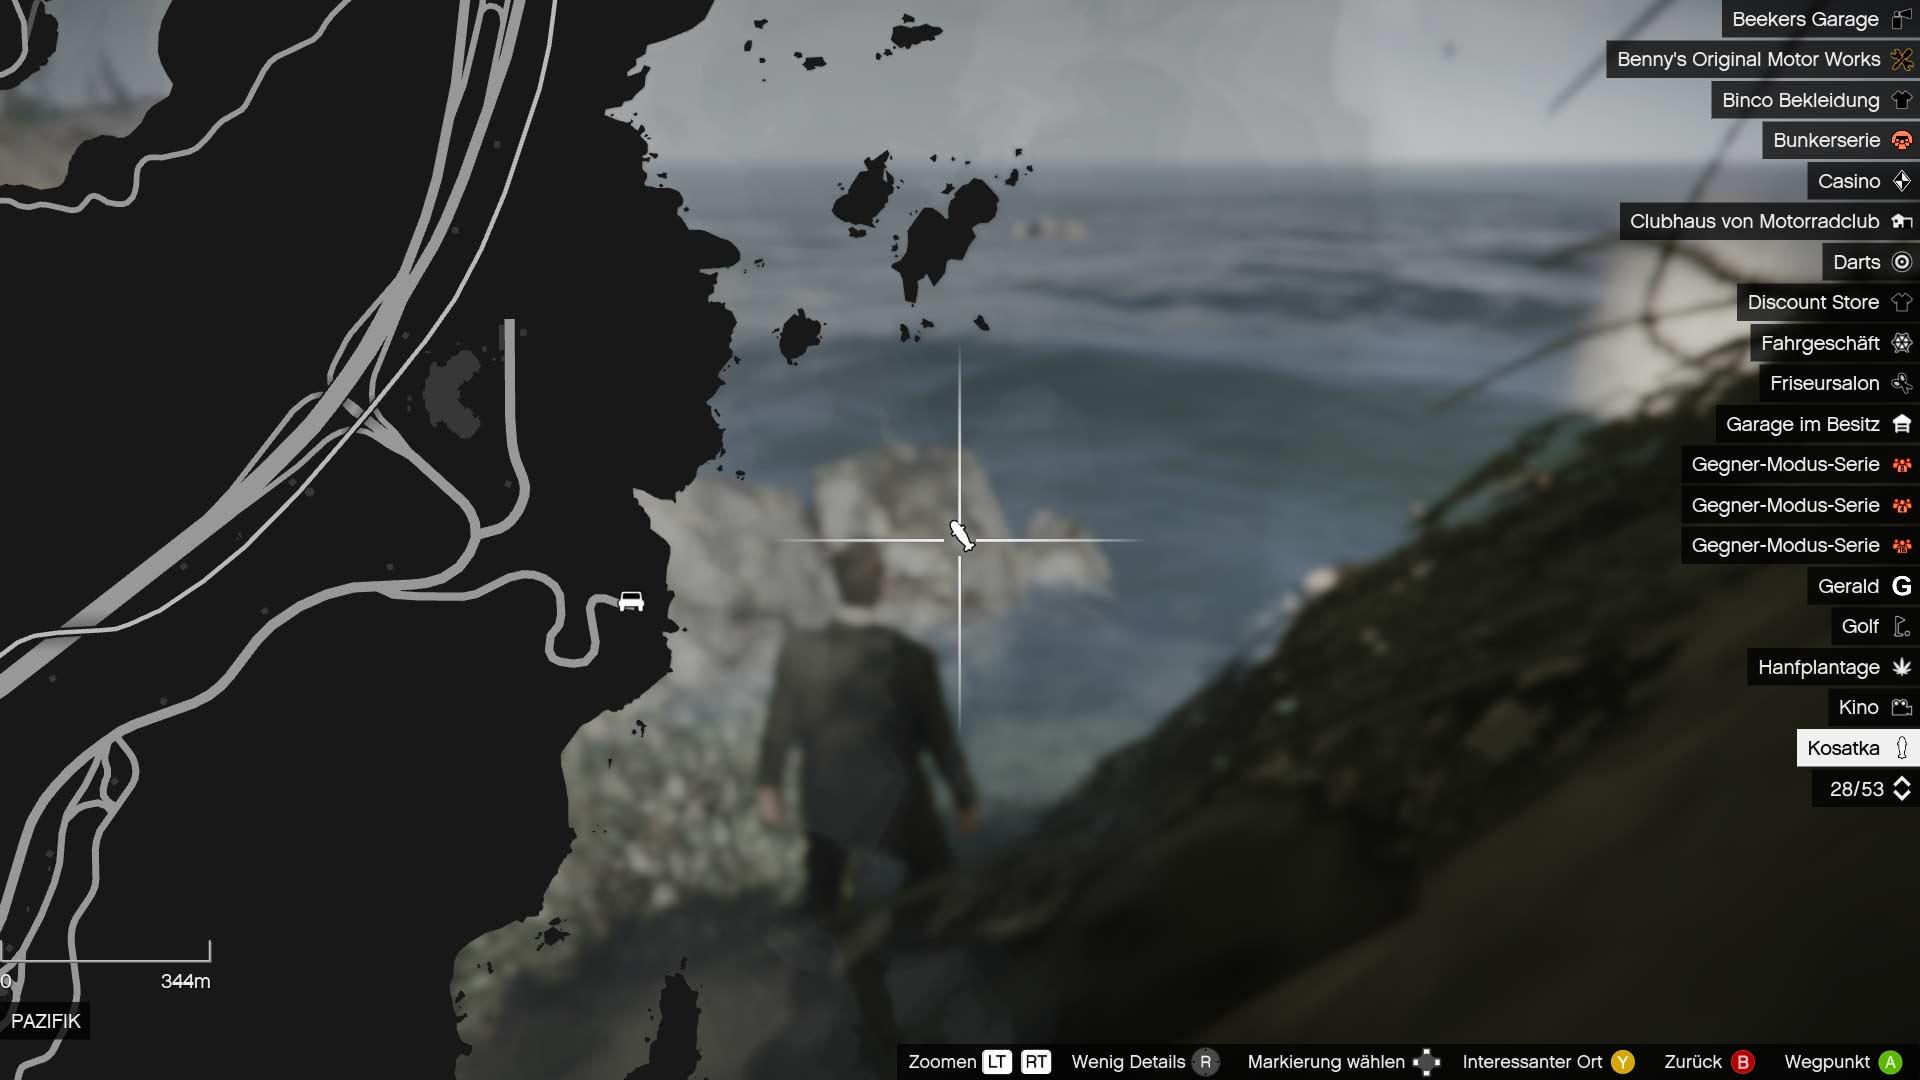 U-Boot Location in GTA Online